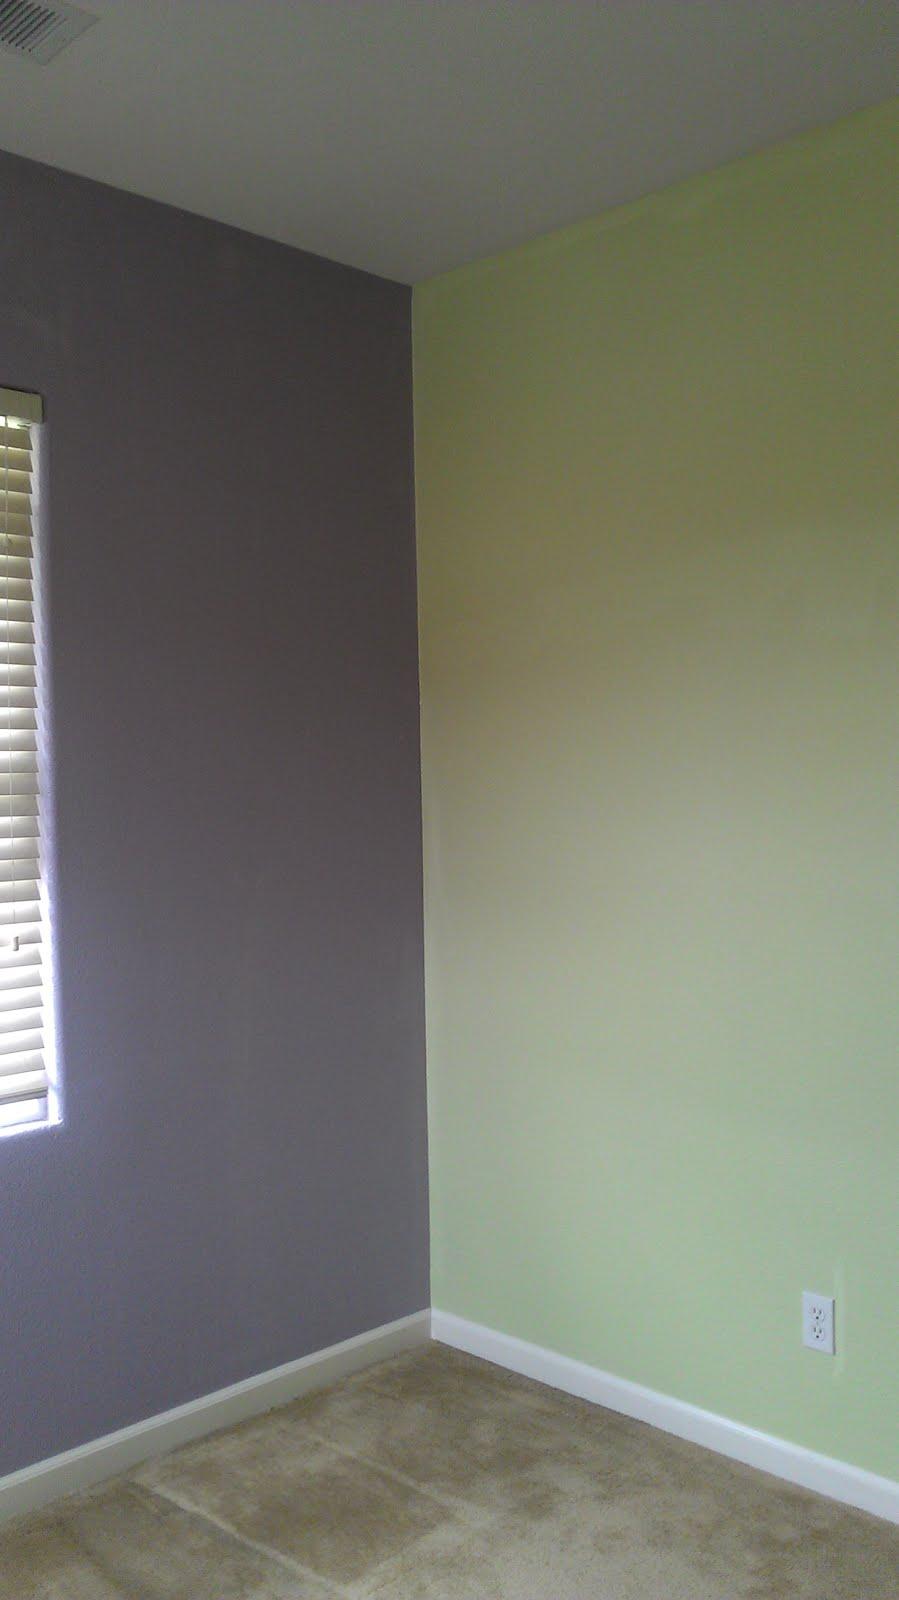 Choosing Paint Colors For Kitchen